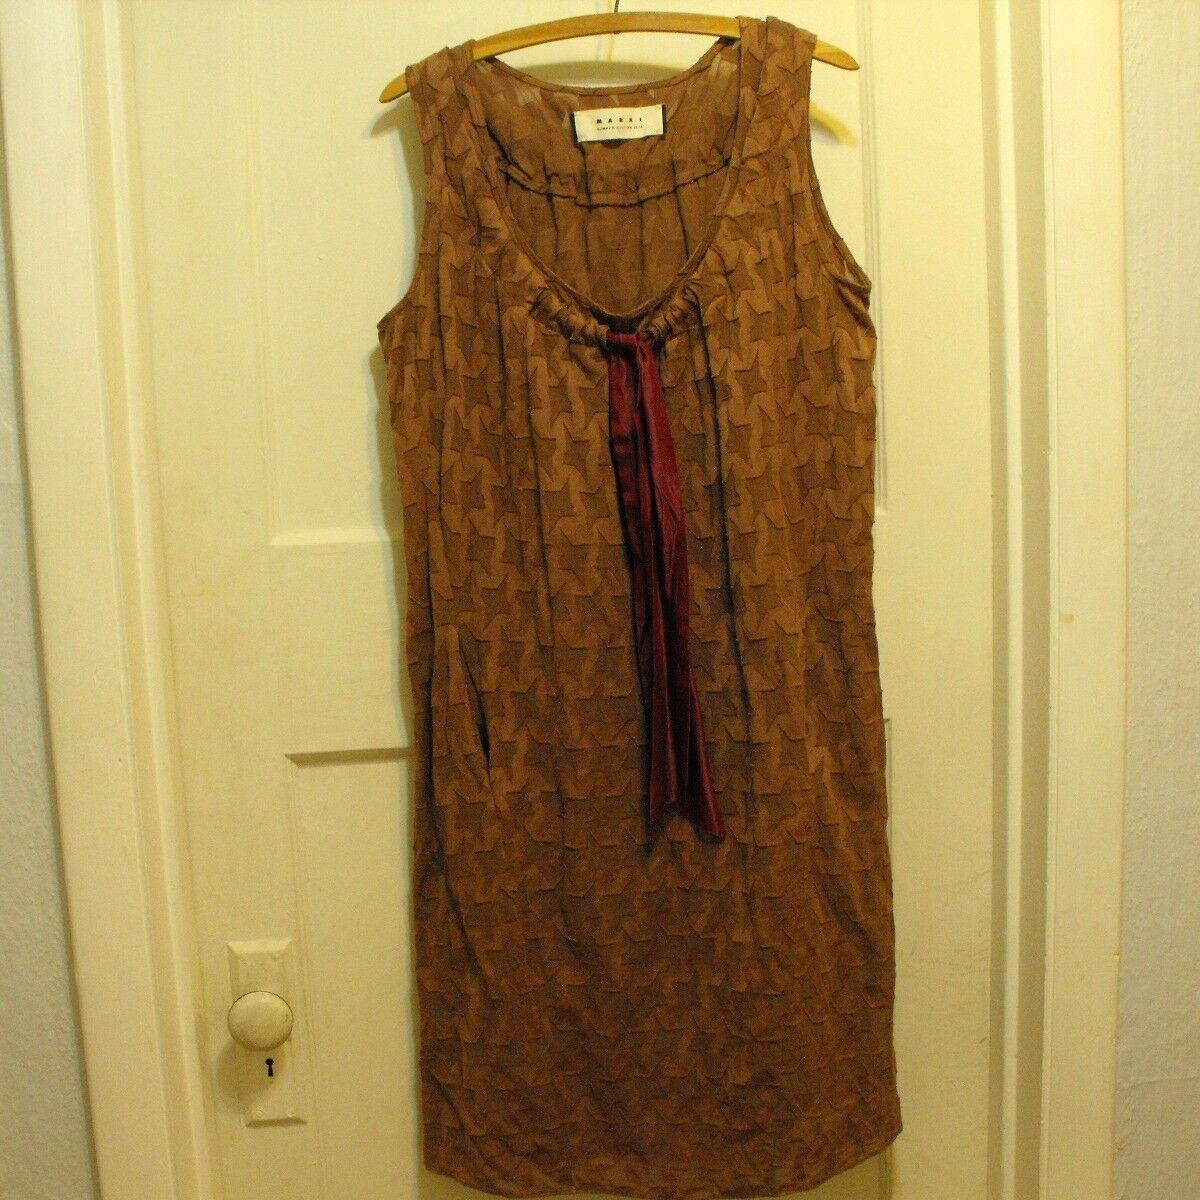 Marni 2010 Summer Edition braun Sleeveless Shift Dress Größe Italian 40 US Größe 4